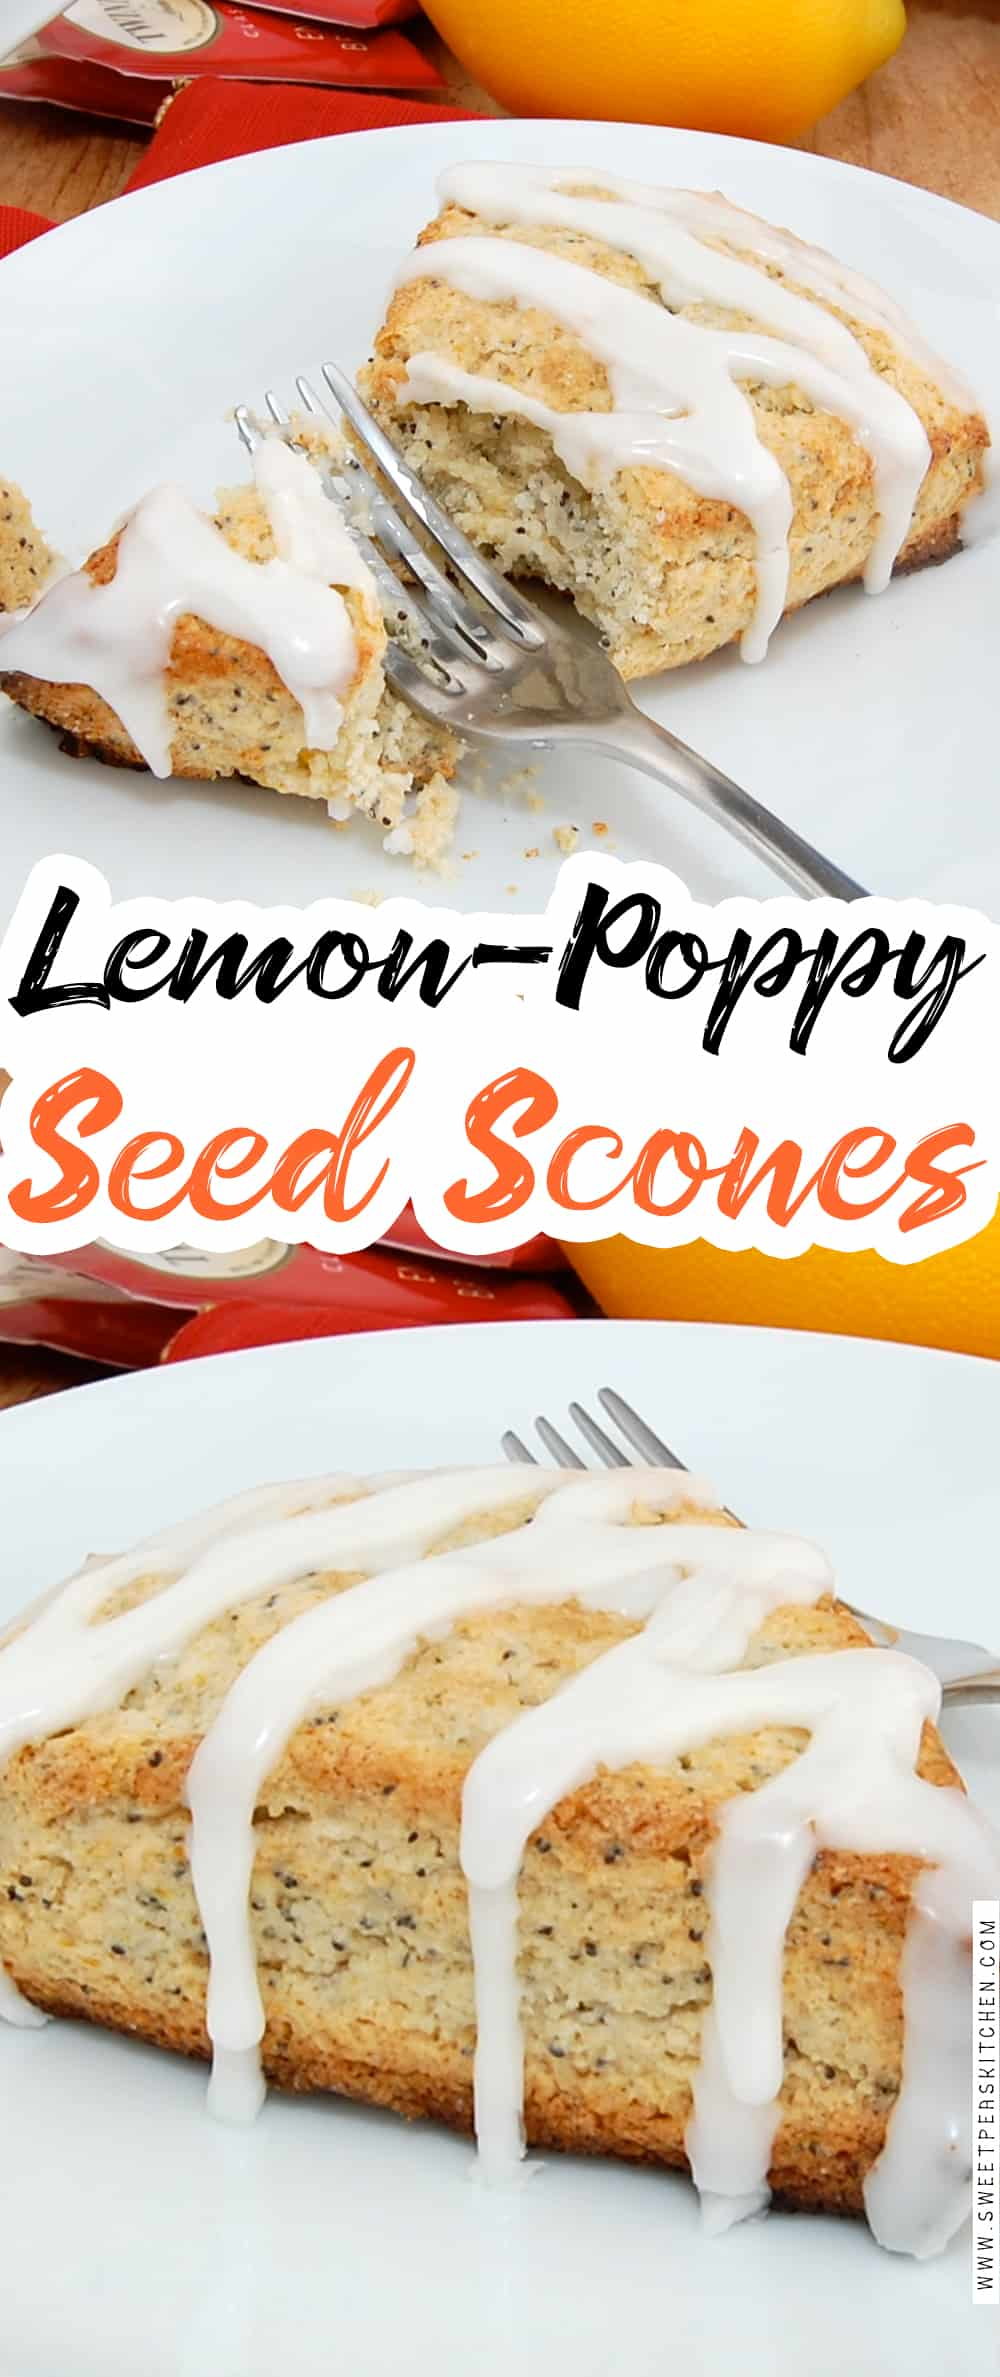 Lemon-Poppy Seed Scones